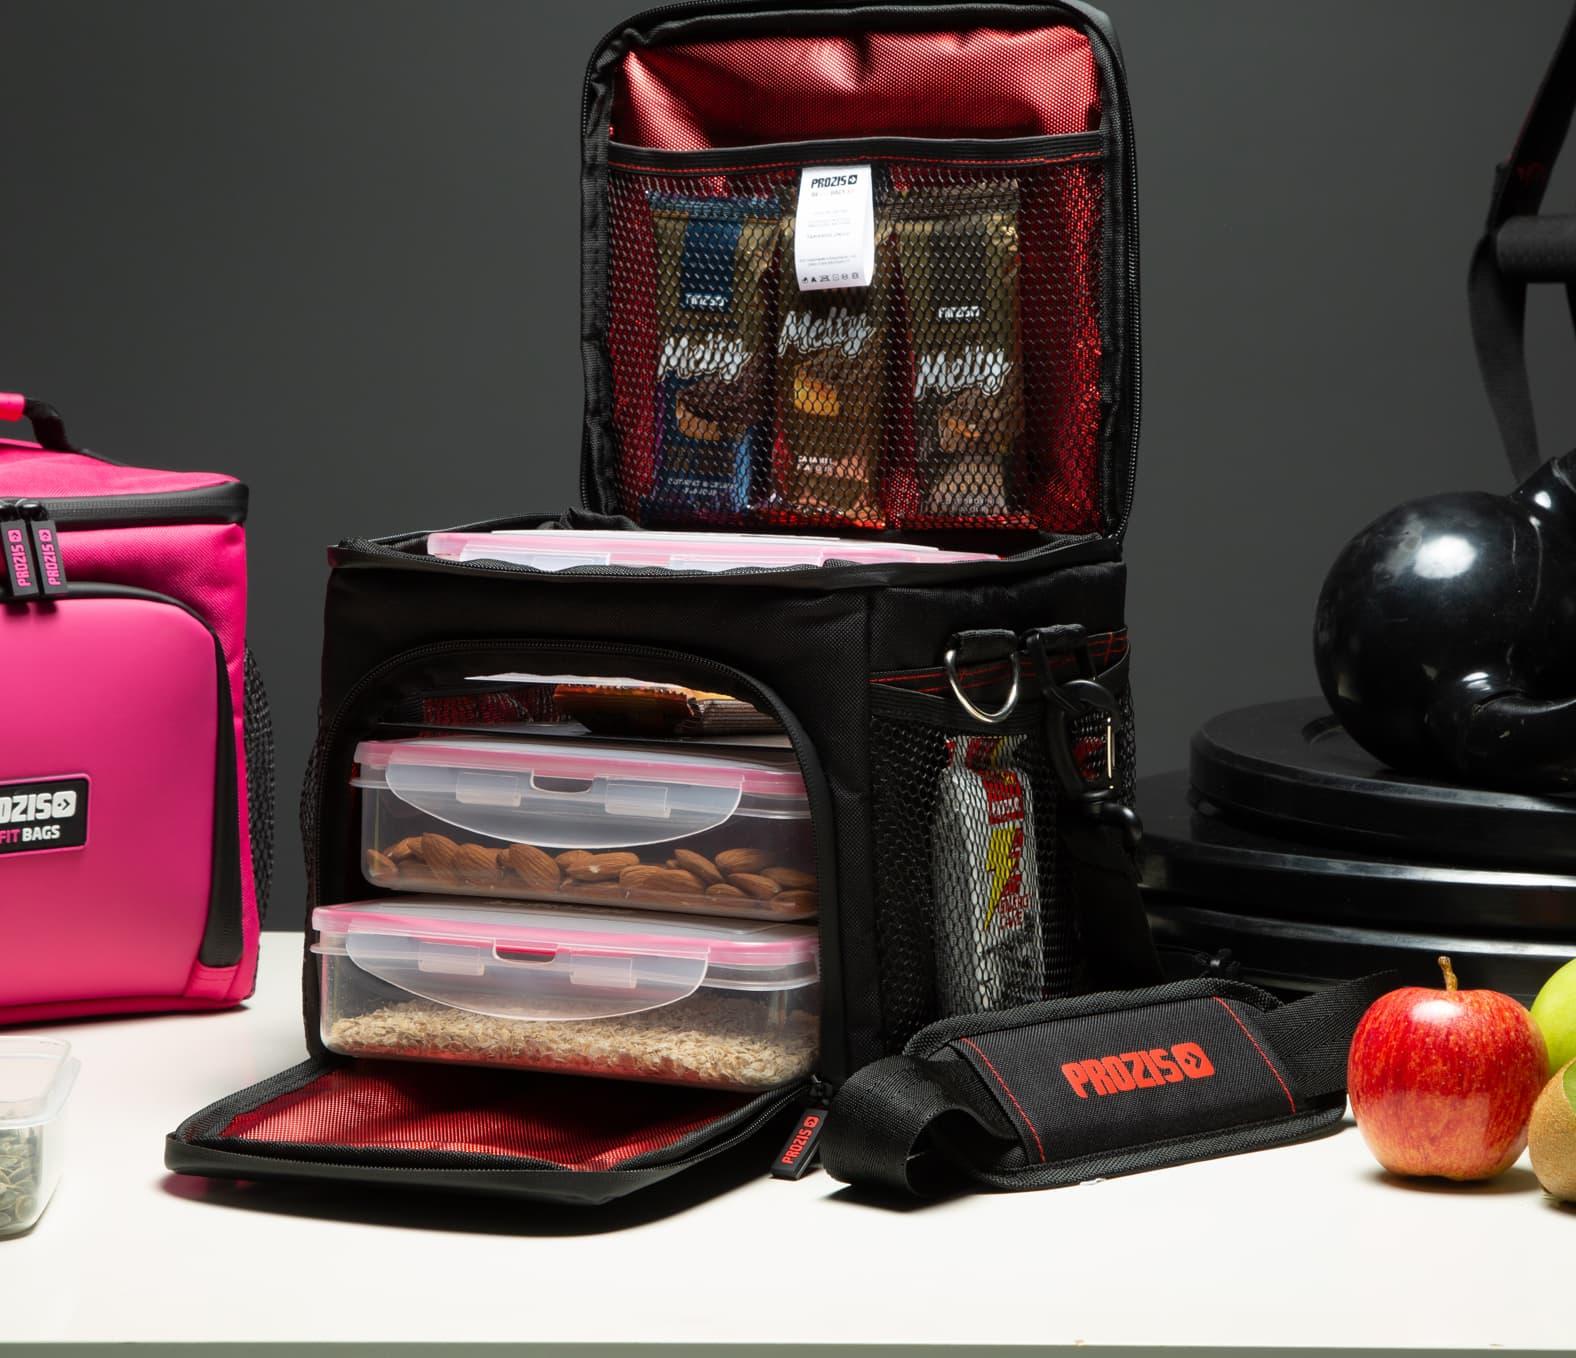 Bolso-Befit-XS-El-bolso-que-se-adapta-a-cualquier-dieta-nevera-portatil-calidad